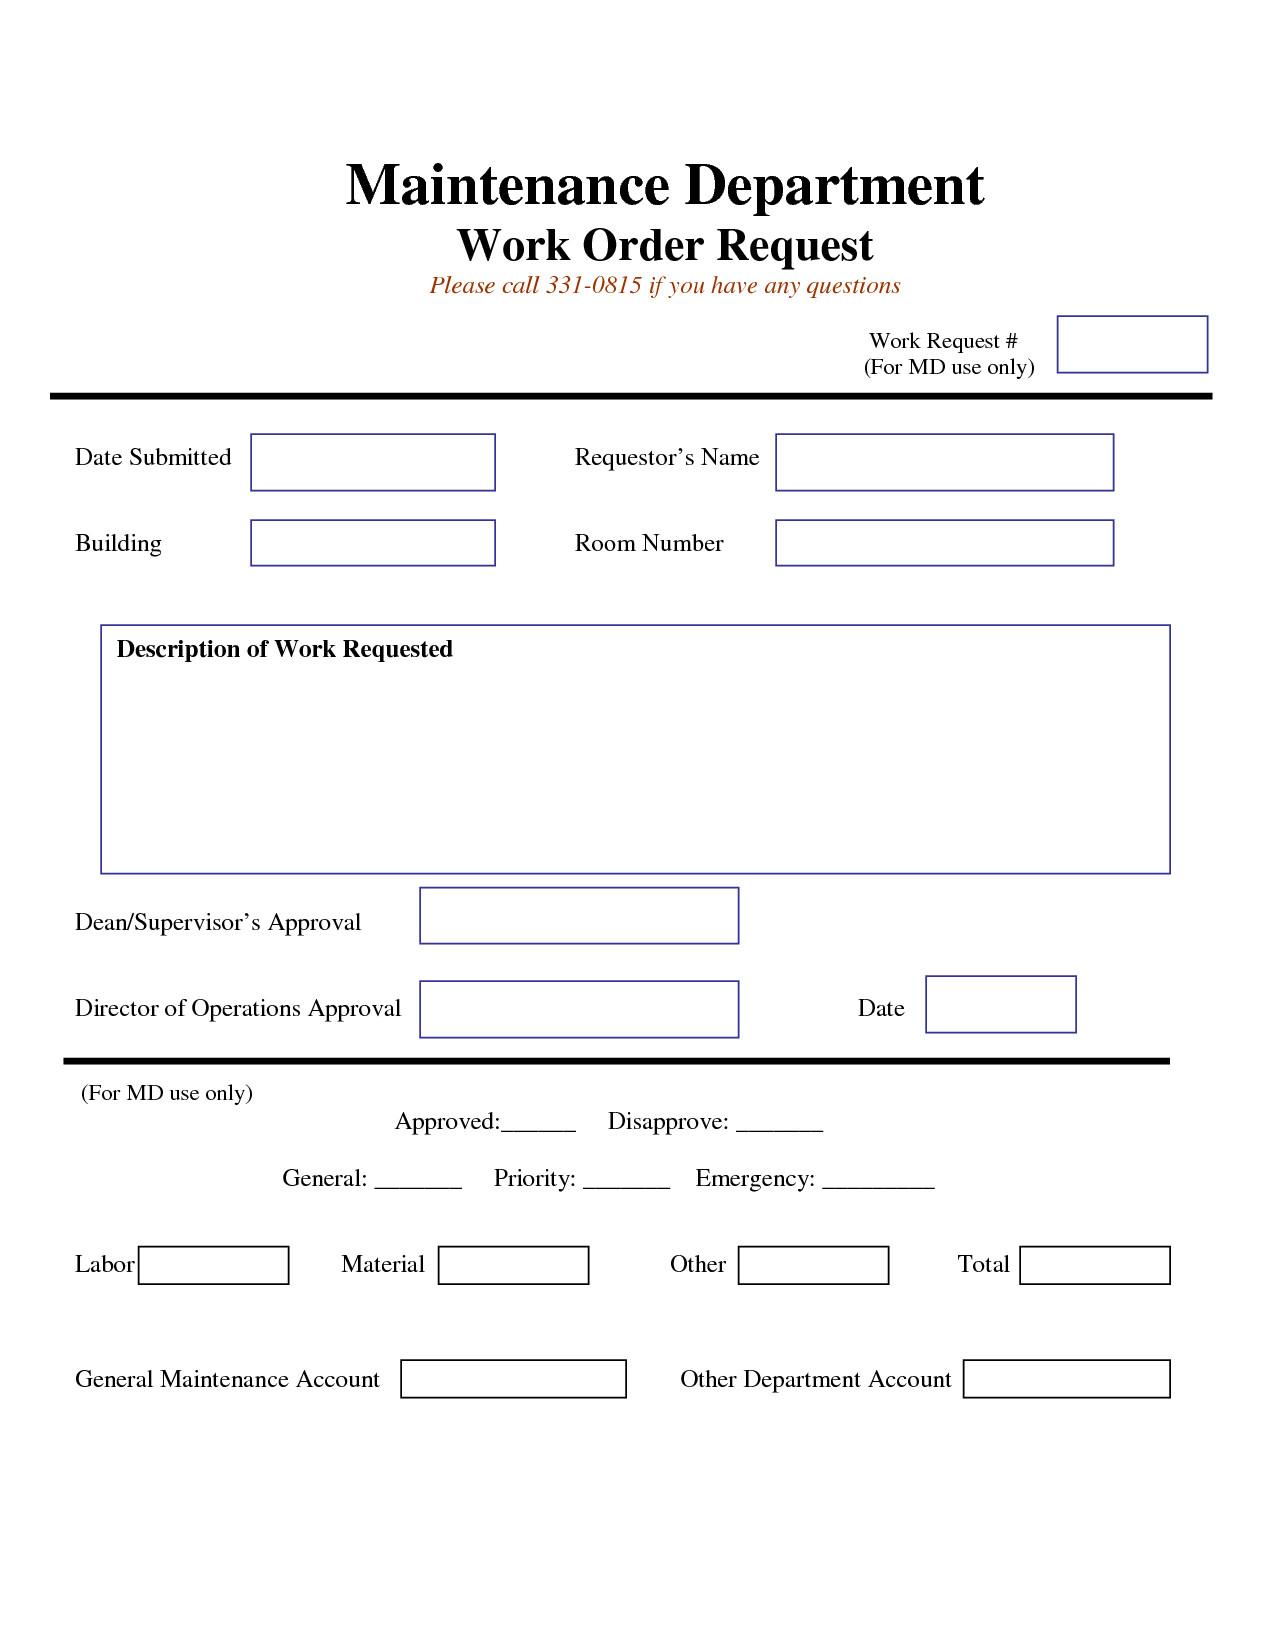 Maintenance Work order Template Work Request form